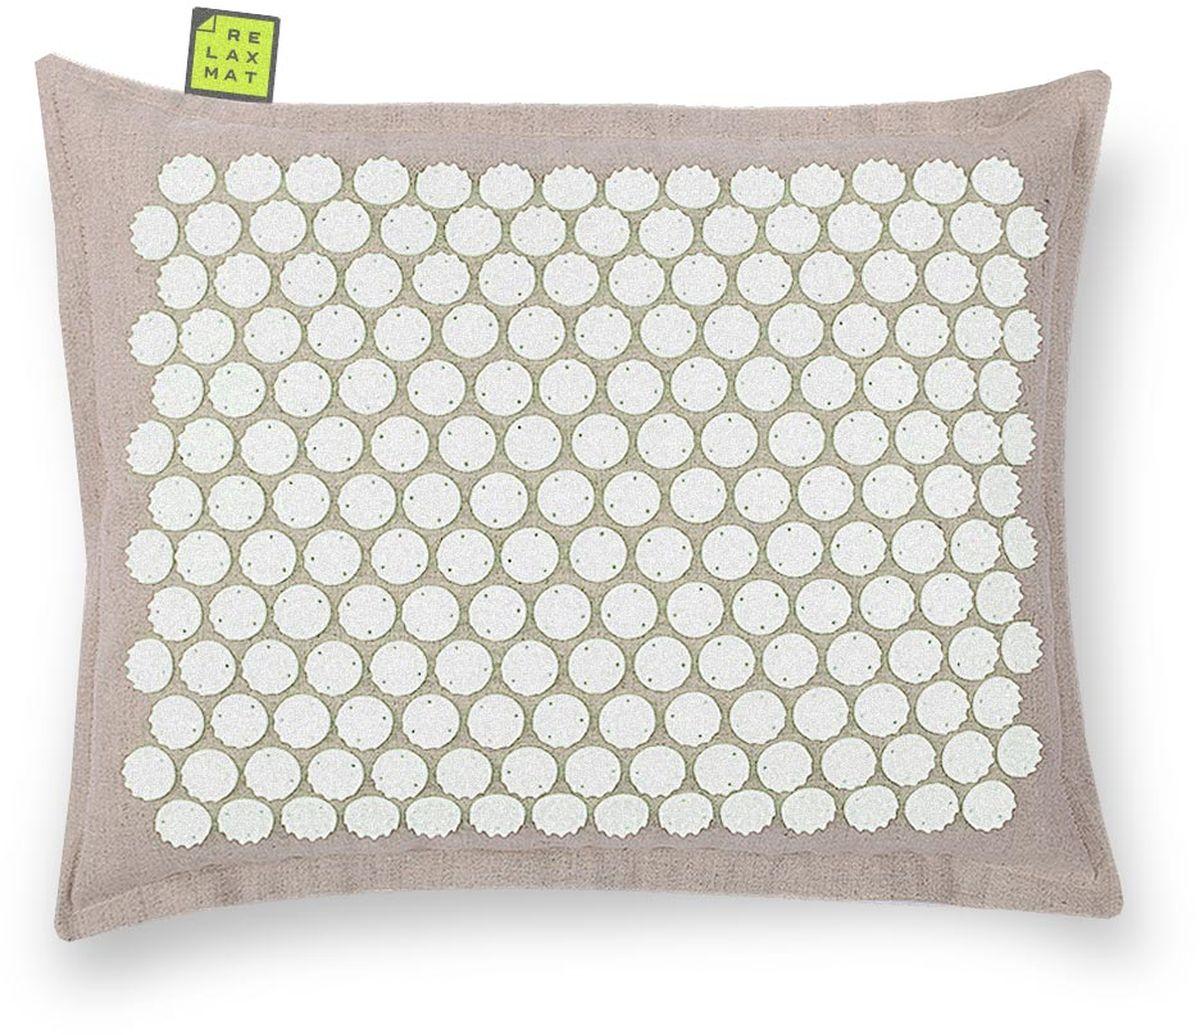 Relaxmat Массажная подушка, цвет: белый